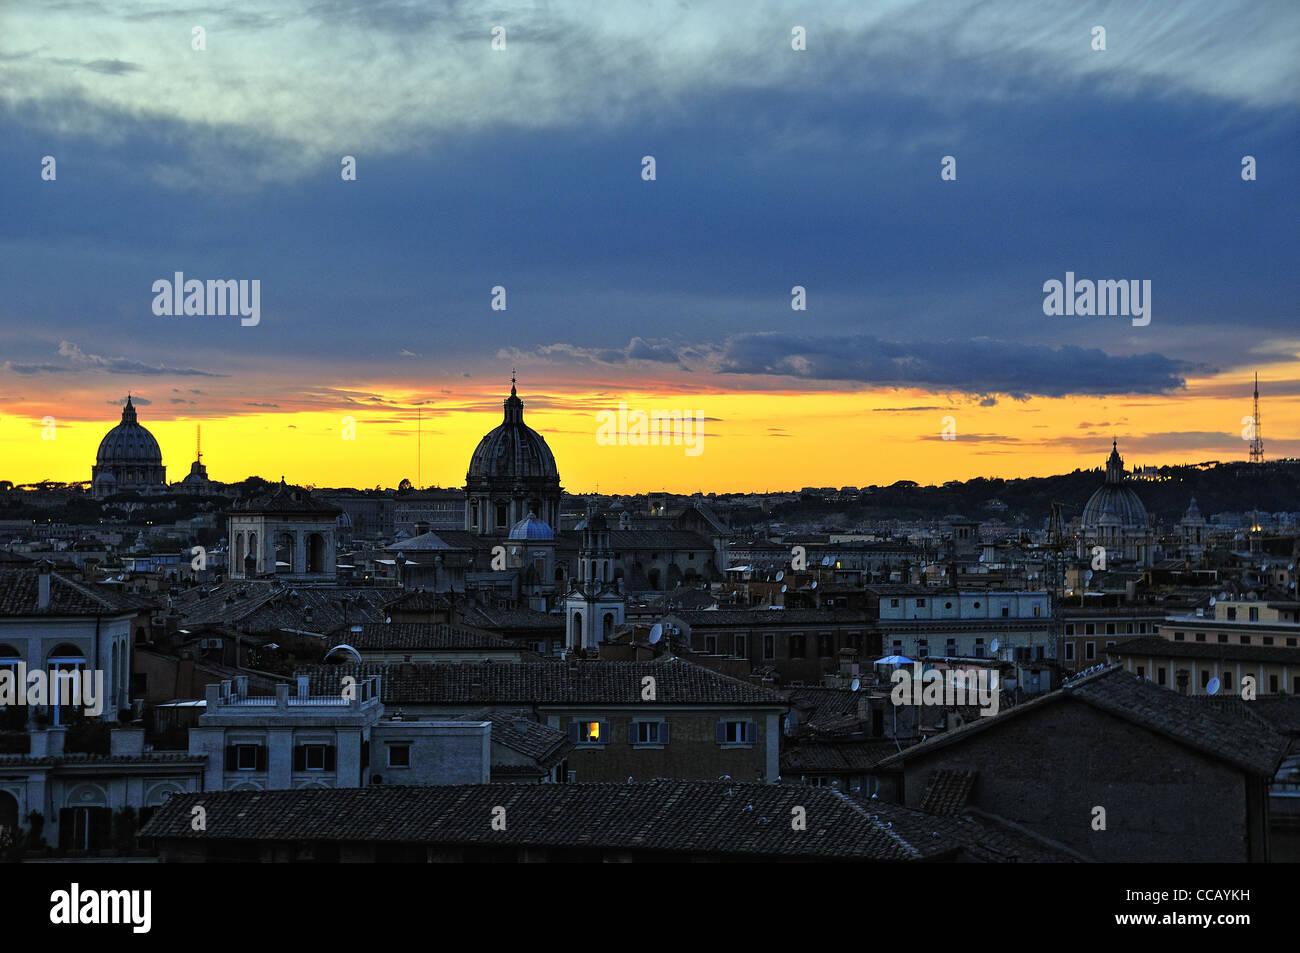 Caffarelli Stock Photos & Caffarelli Stock Images - Alamy